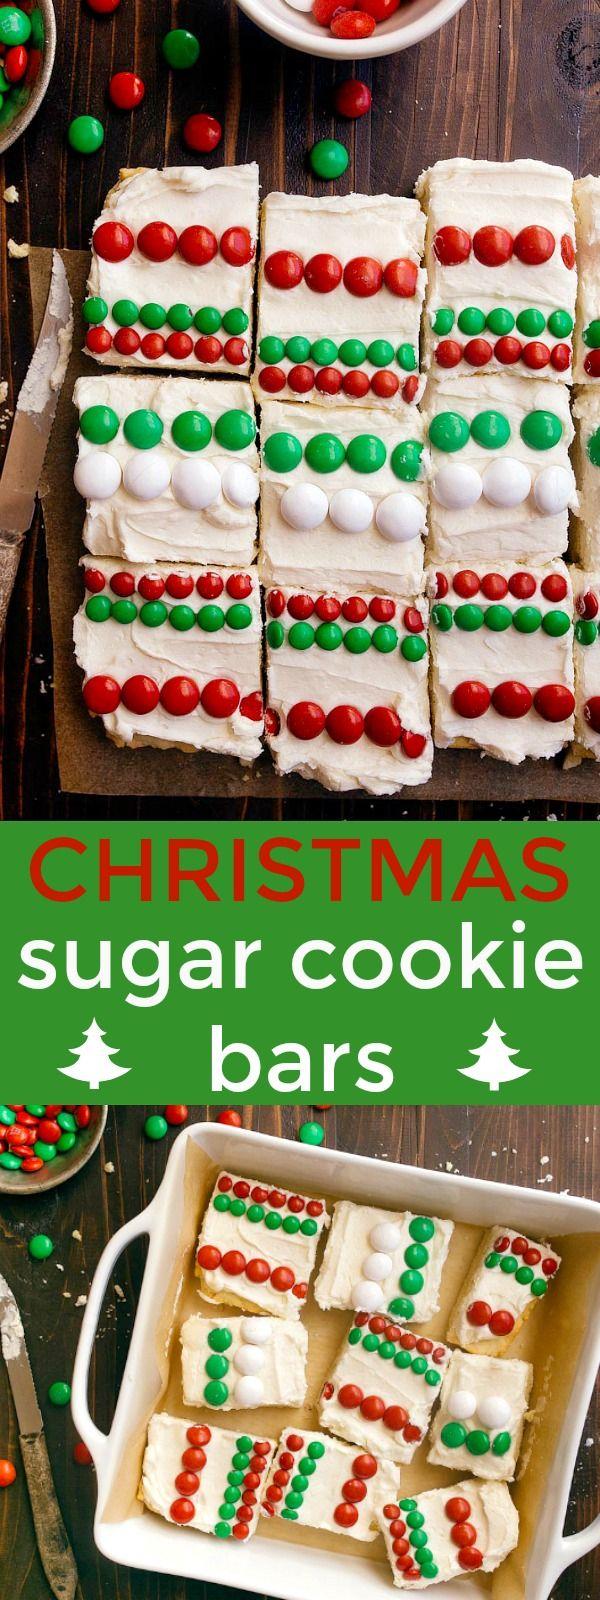 Christmas sugar cookie bars: easy cookies for Santa! M&Ms sugar cookie bars for Santa. via @dessertfortwo